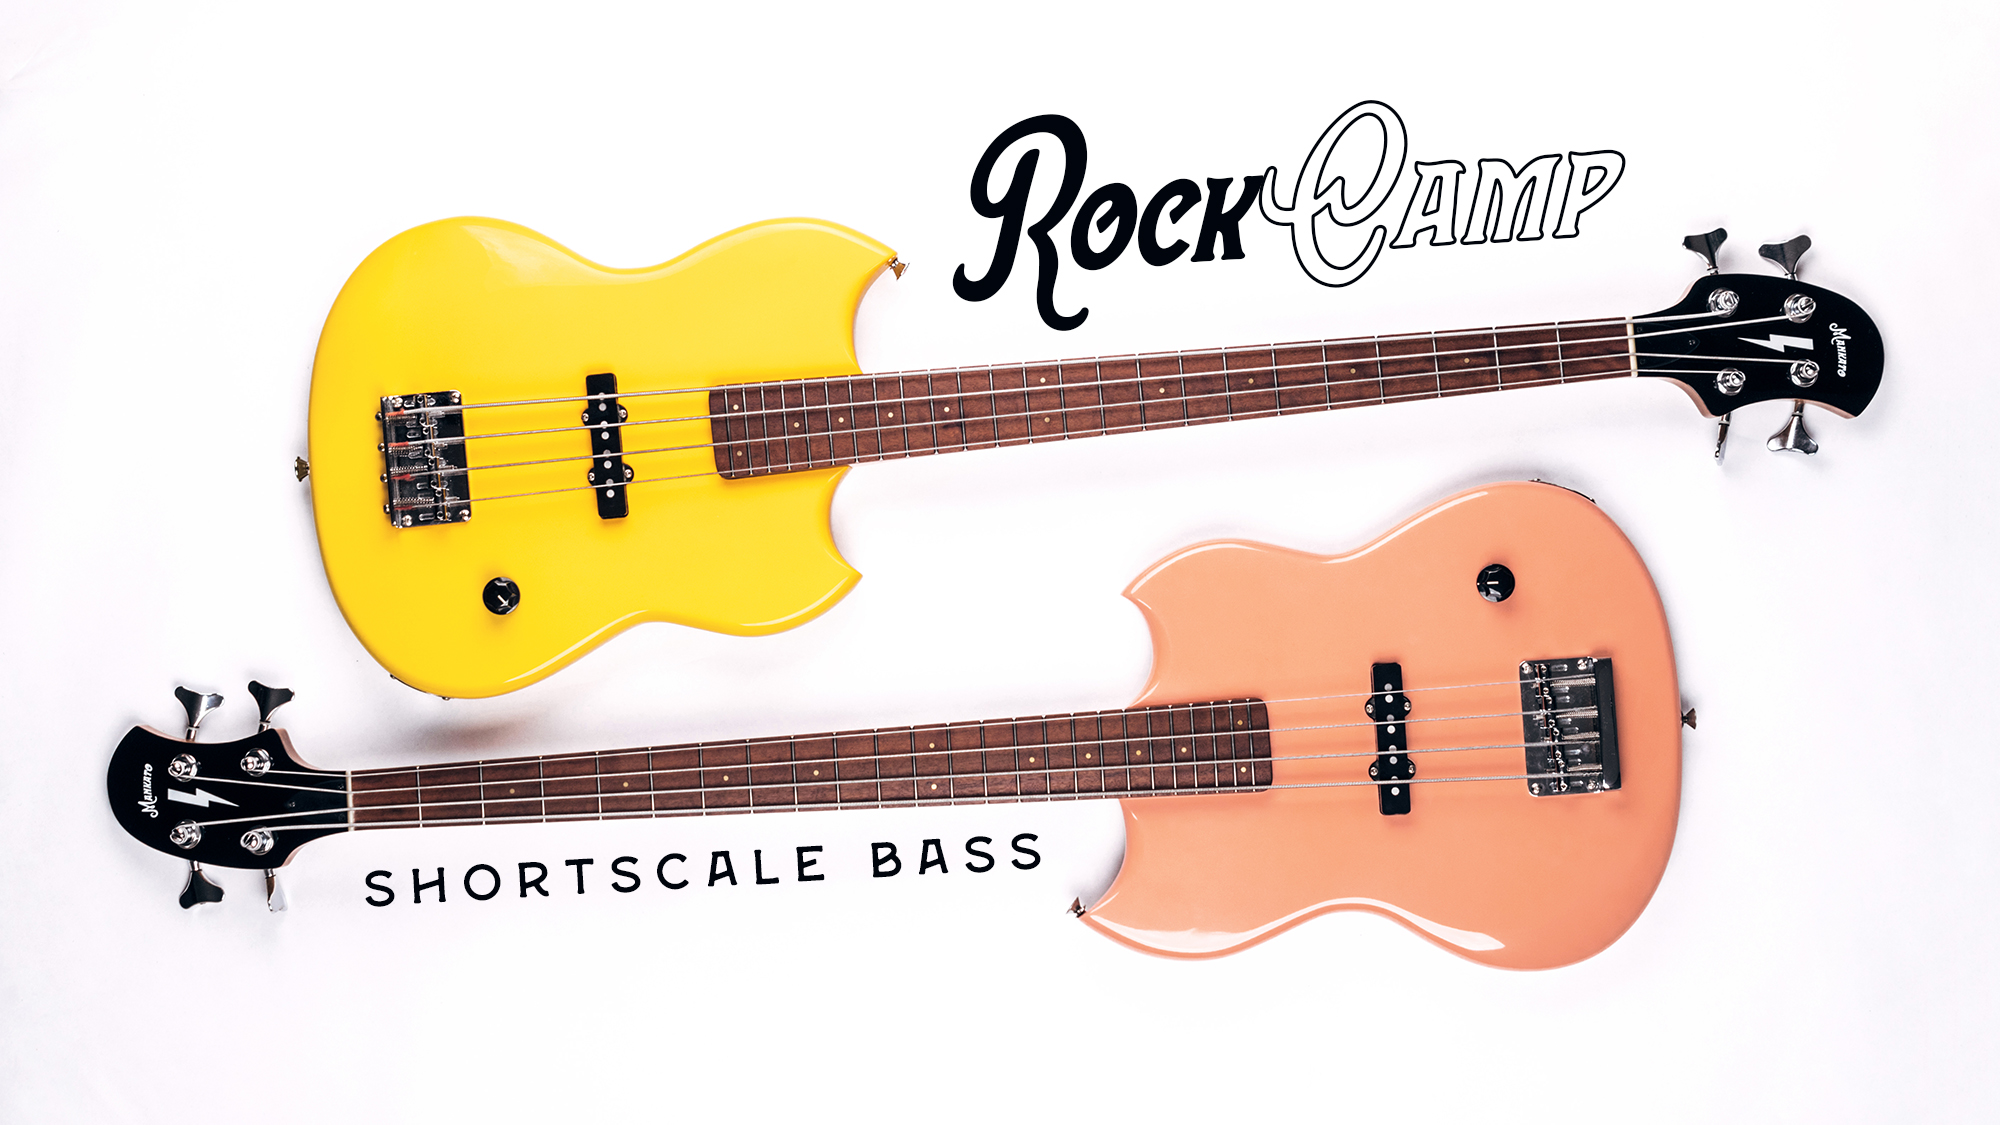 Mankato Rock Camp Bass models.